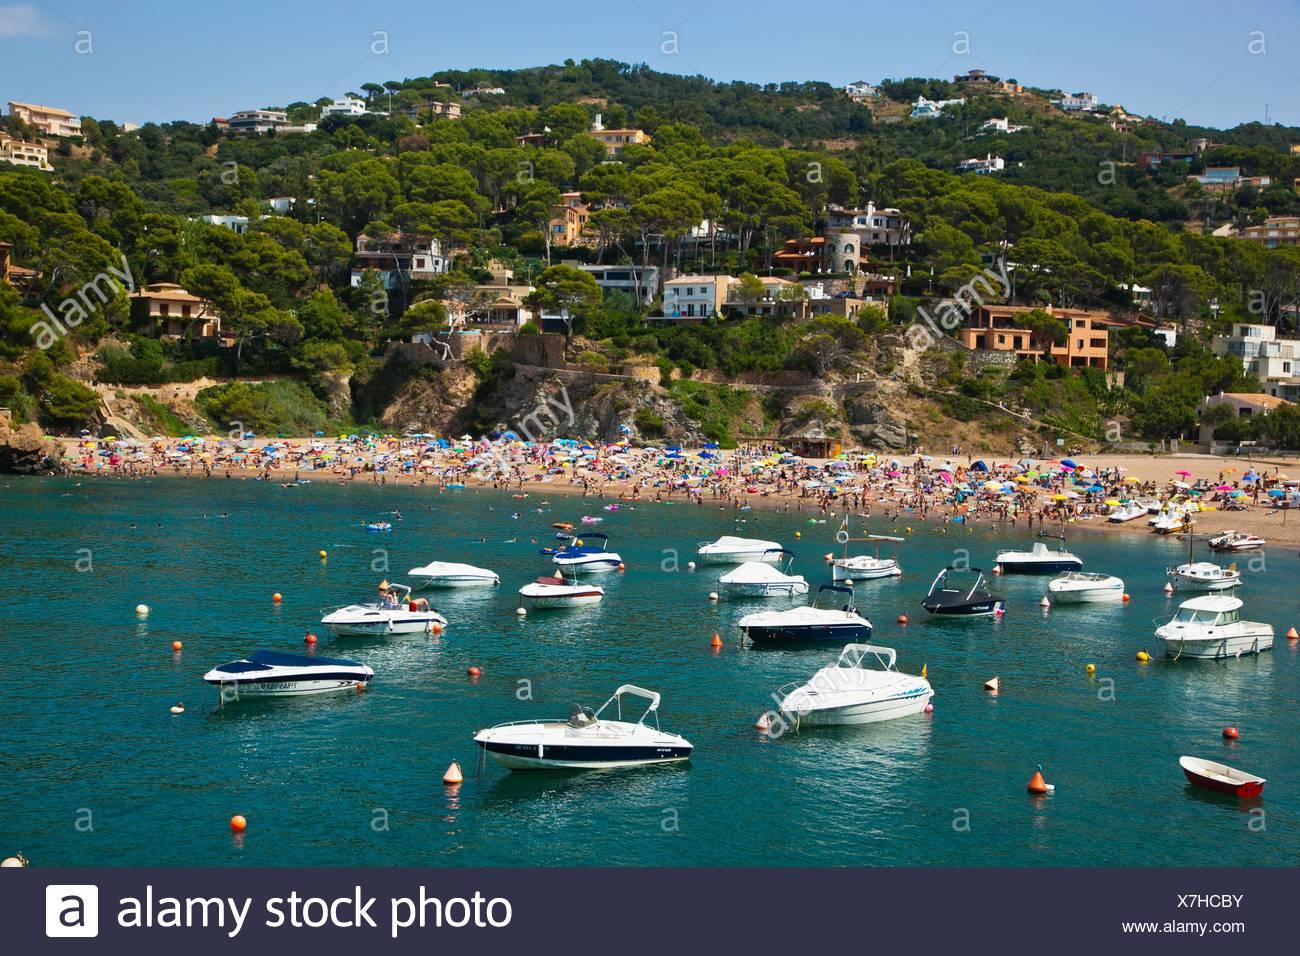 Sa Riera beach, Begur, Baix Empordá, Costa Brava, Girona Province, Catalonia, Spain. - Stock Image